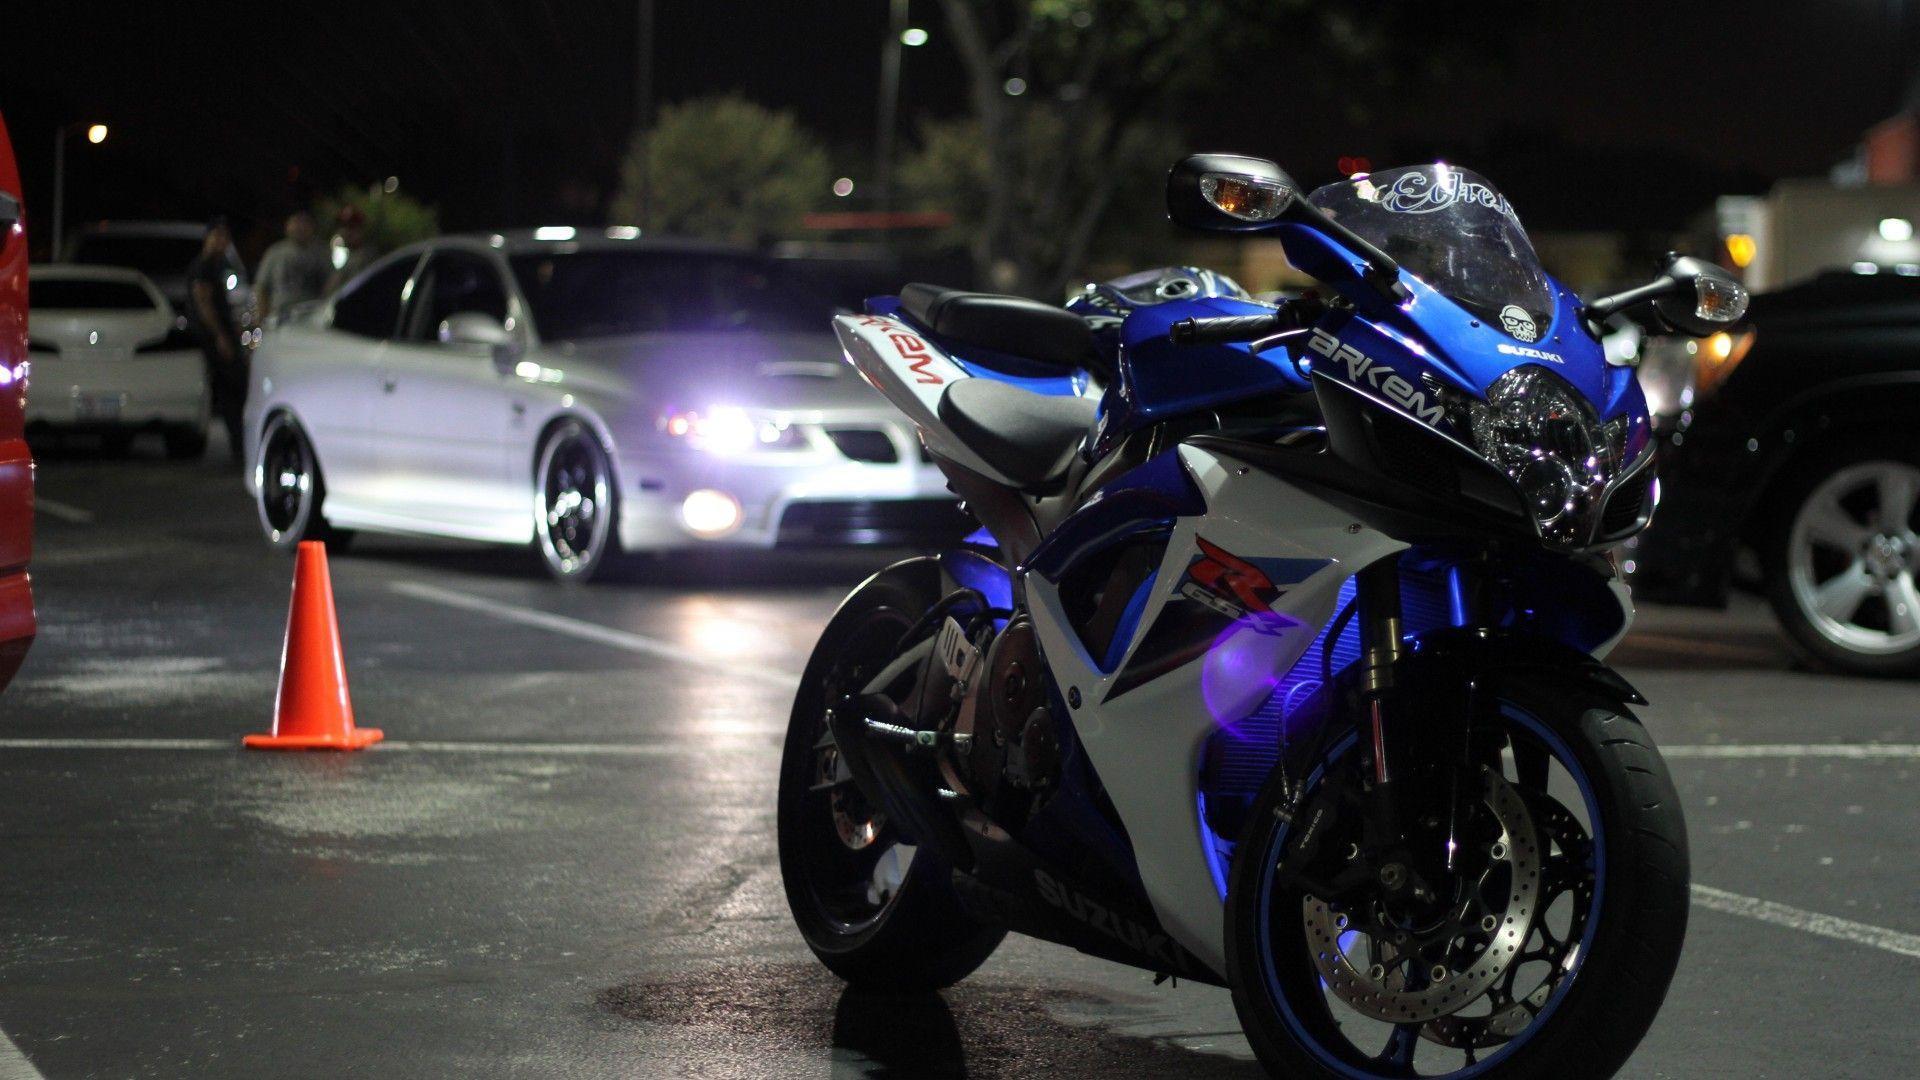 motor sports full hd - photo #15